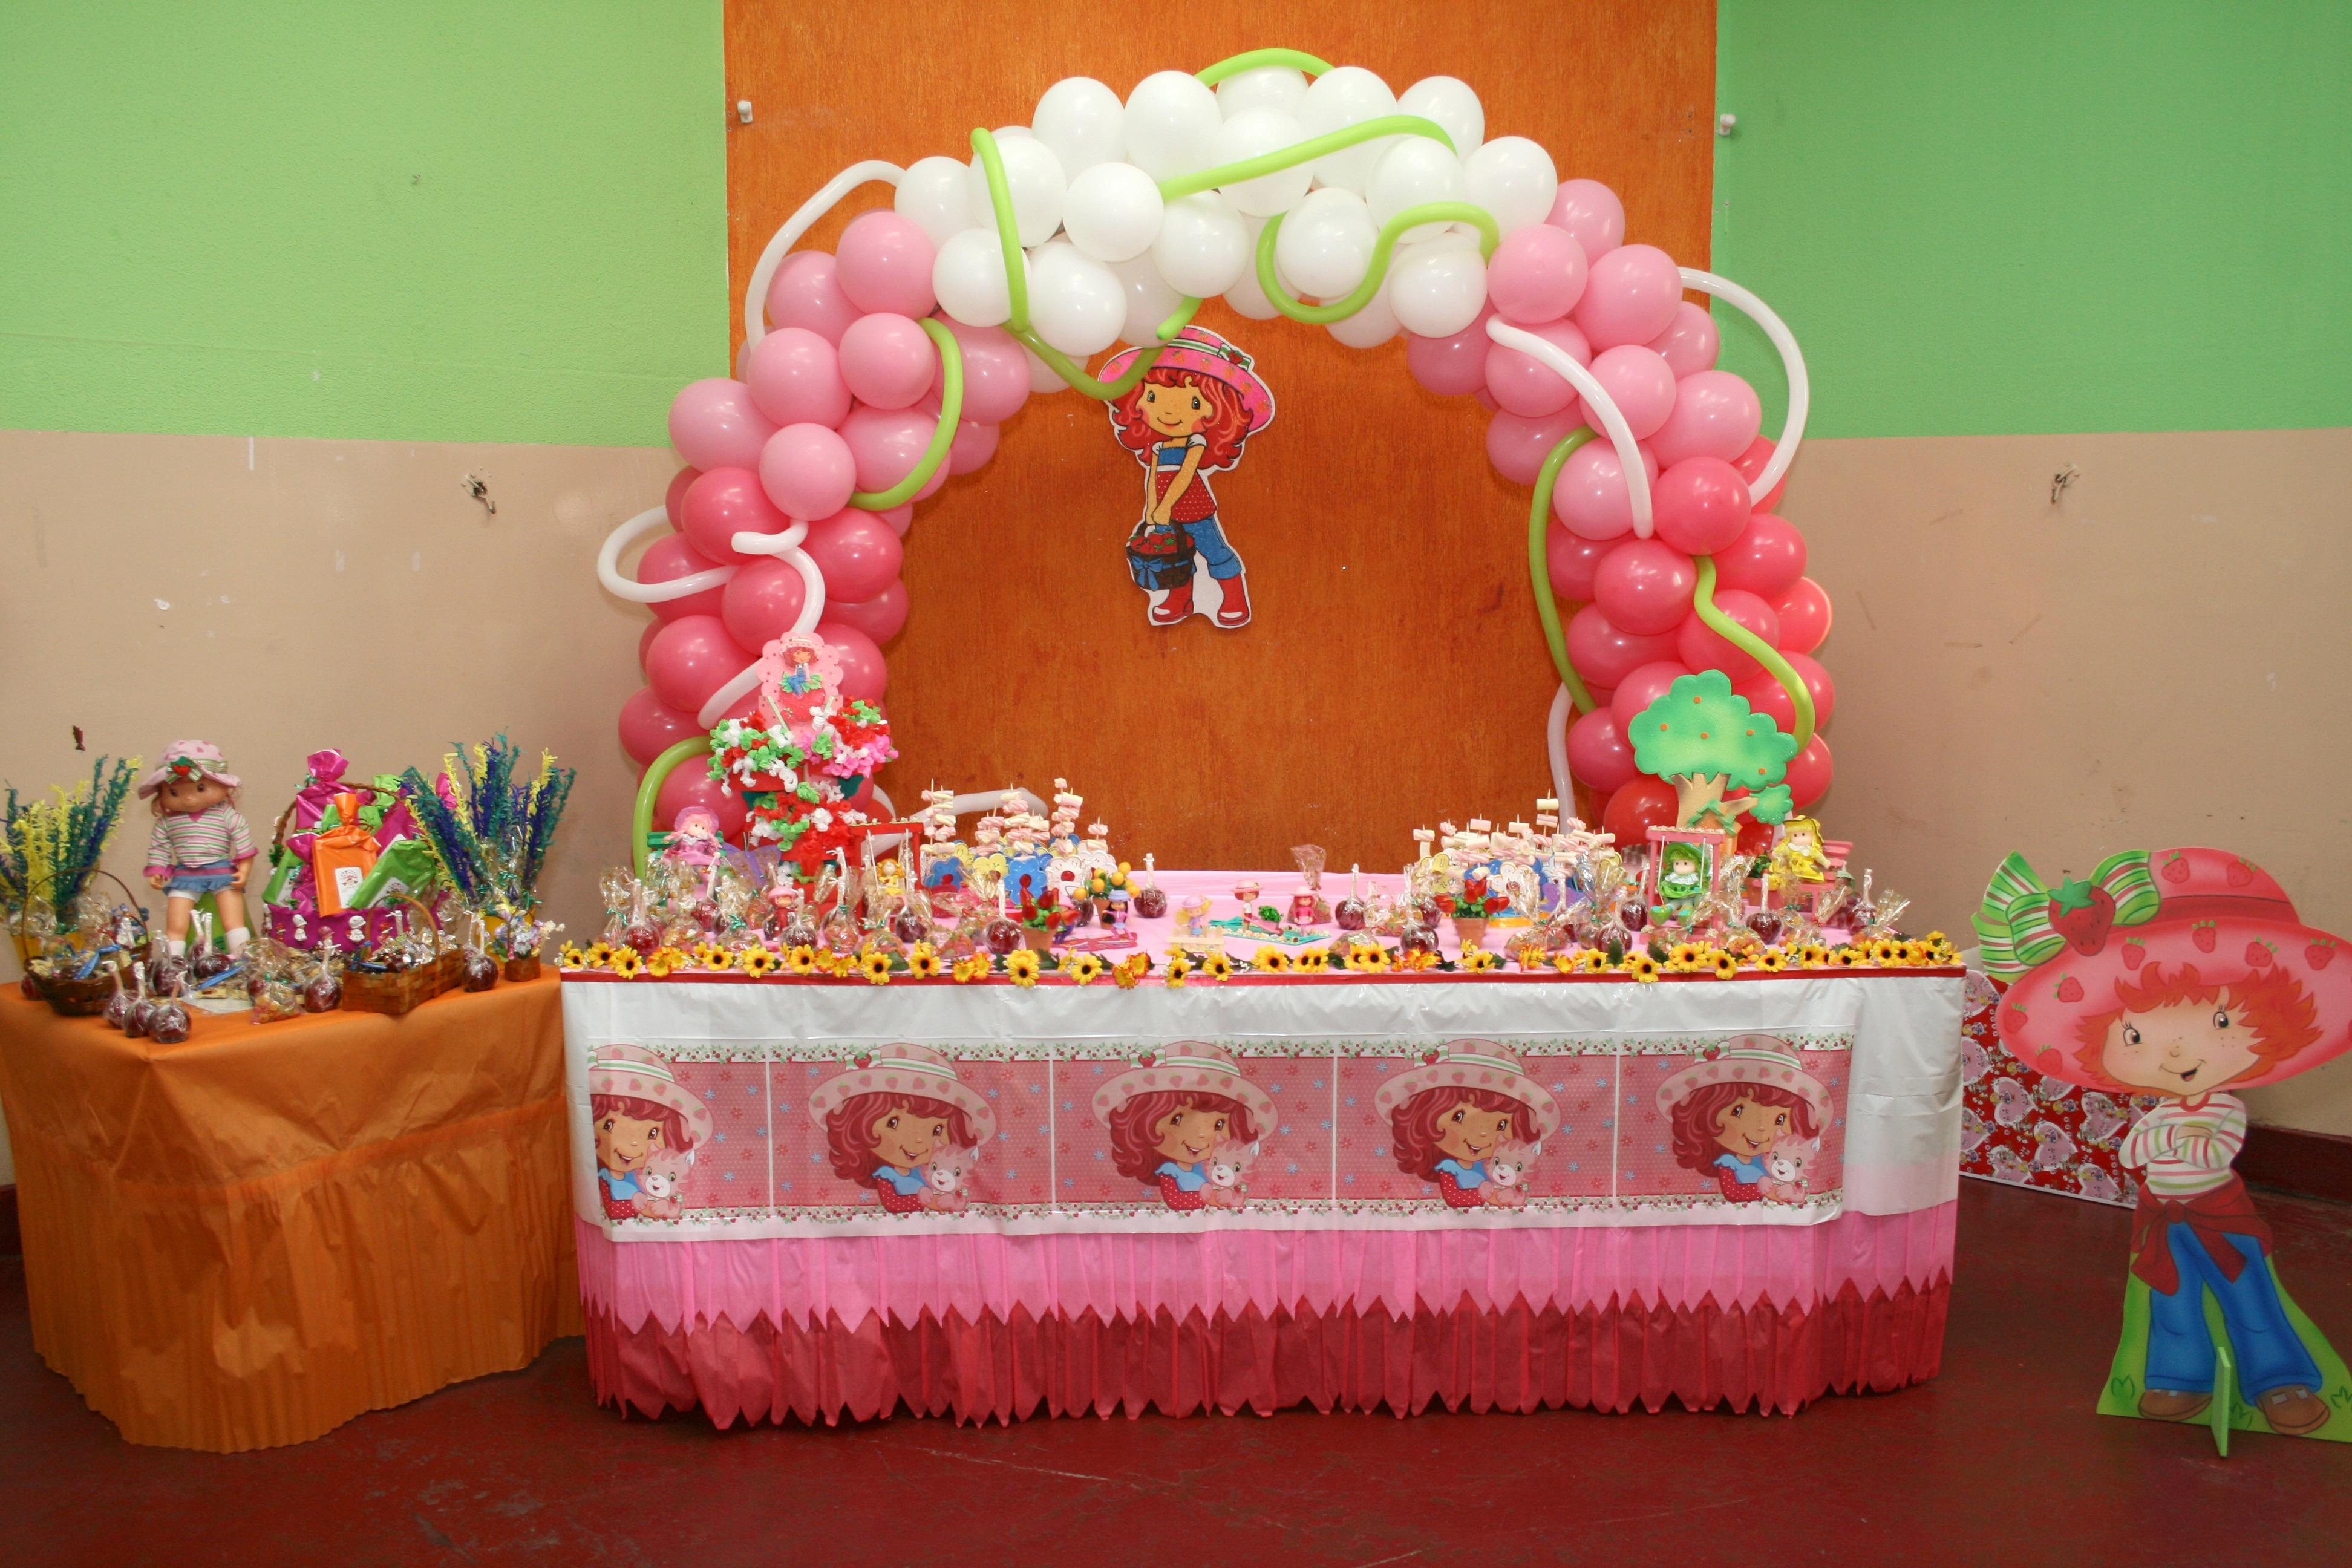 112. decoracao para festa infantil xuxinha:decoracao de festa infantil  #7F2917 3888 2592